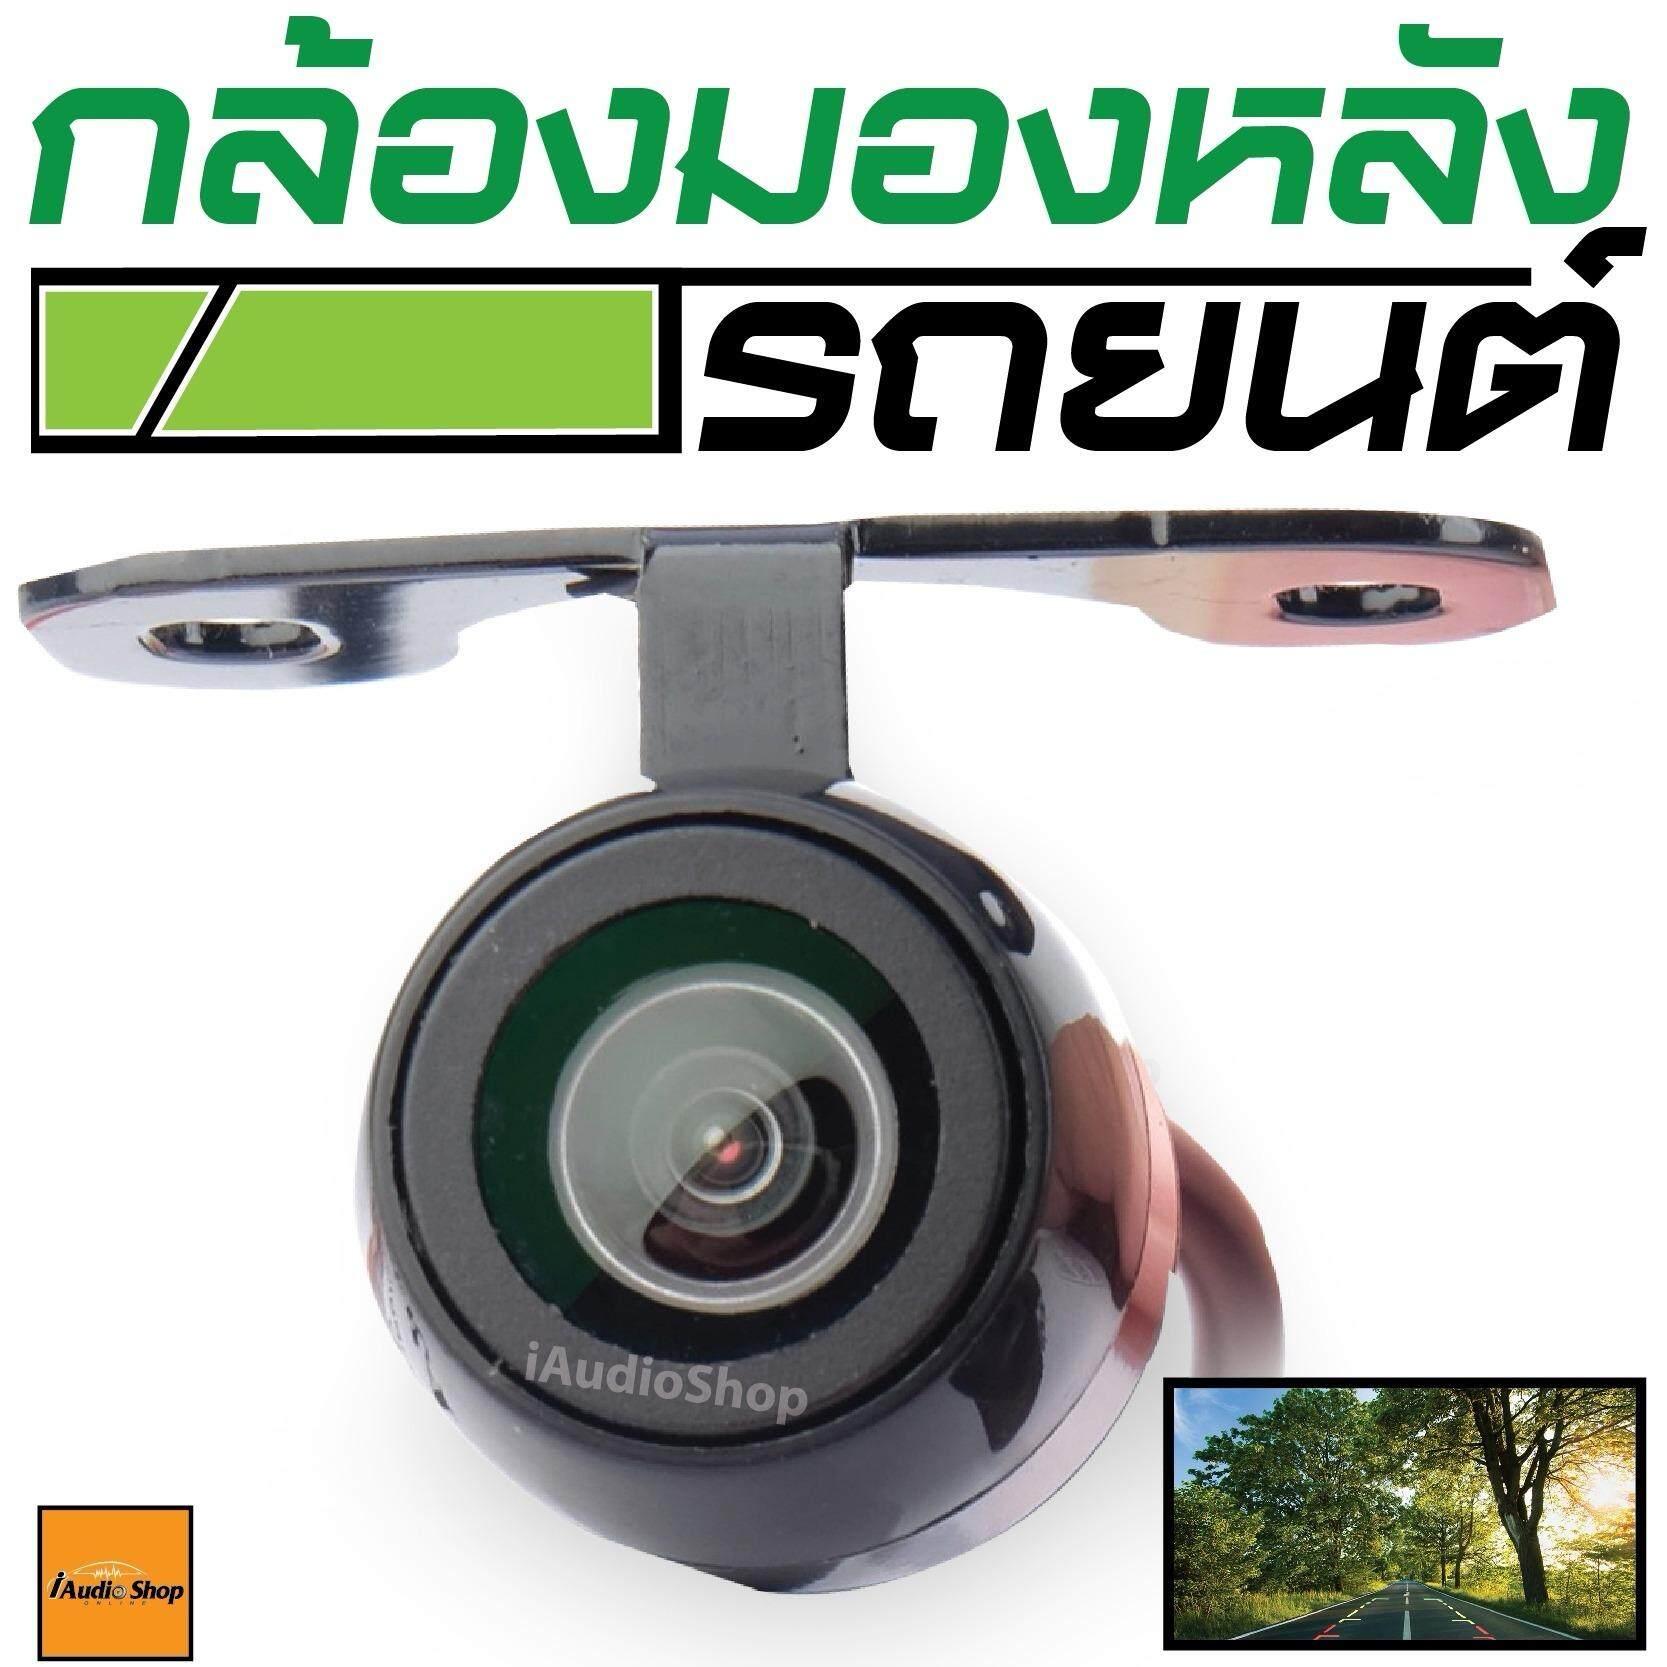 SMART CAM Series By DZ กล้องมองหลัง, กล้องถอย DZ-524 ชัดแจ๋ว มีเส้นบอกระยะ อย่างดี กันน้ำ กันฝุ่น